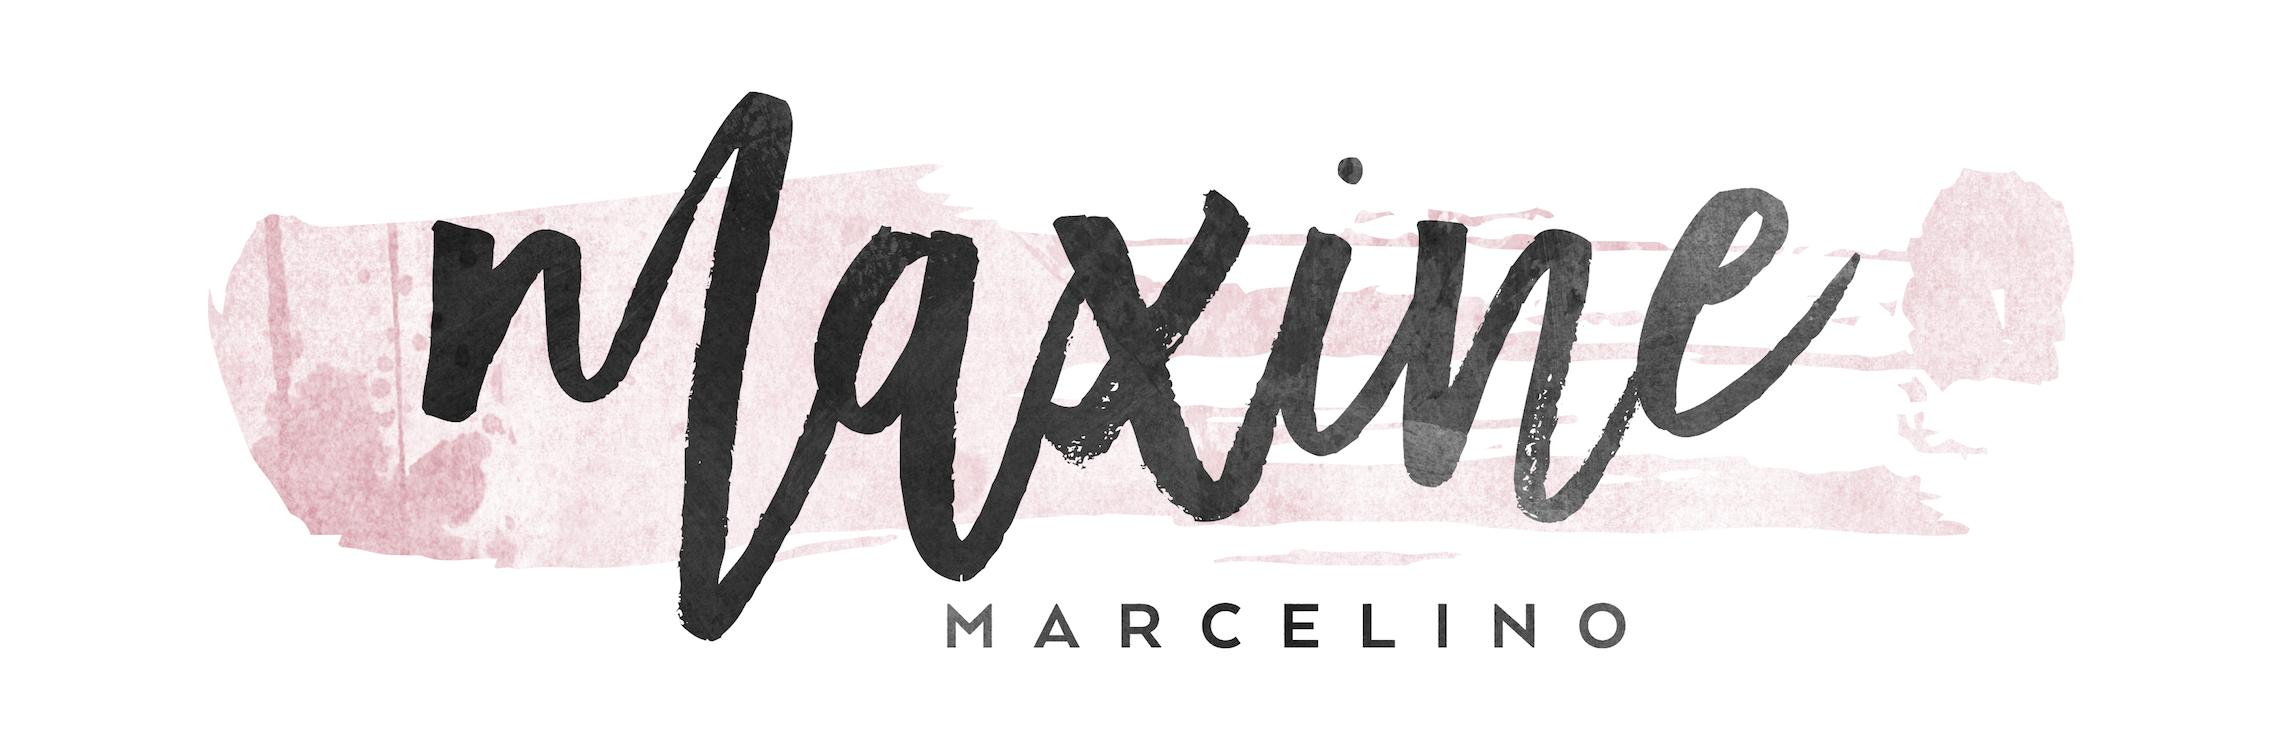 Maxine Marcelino